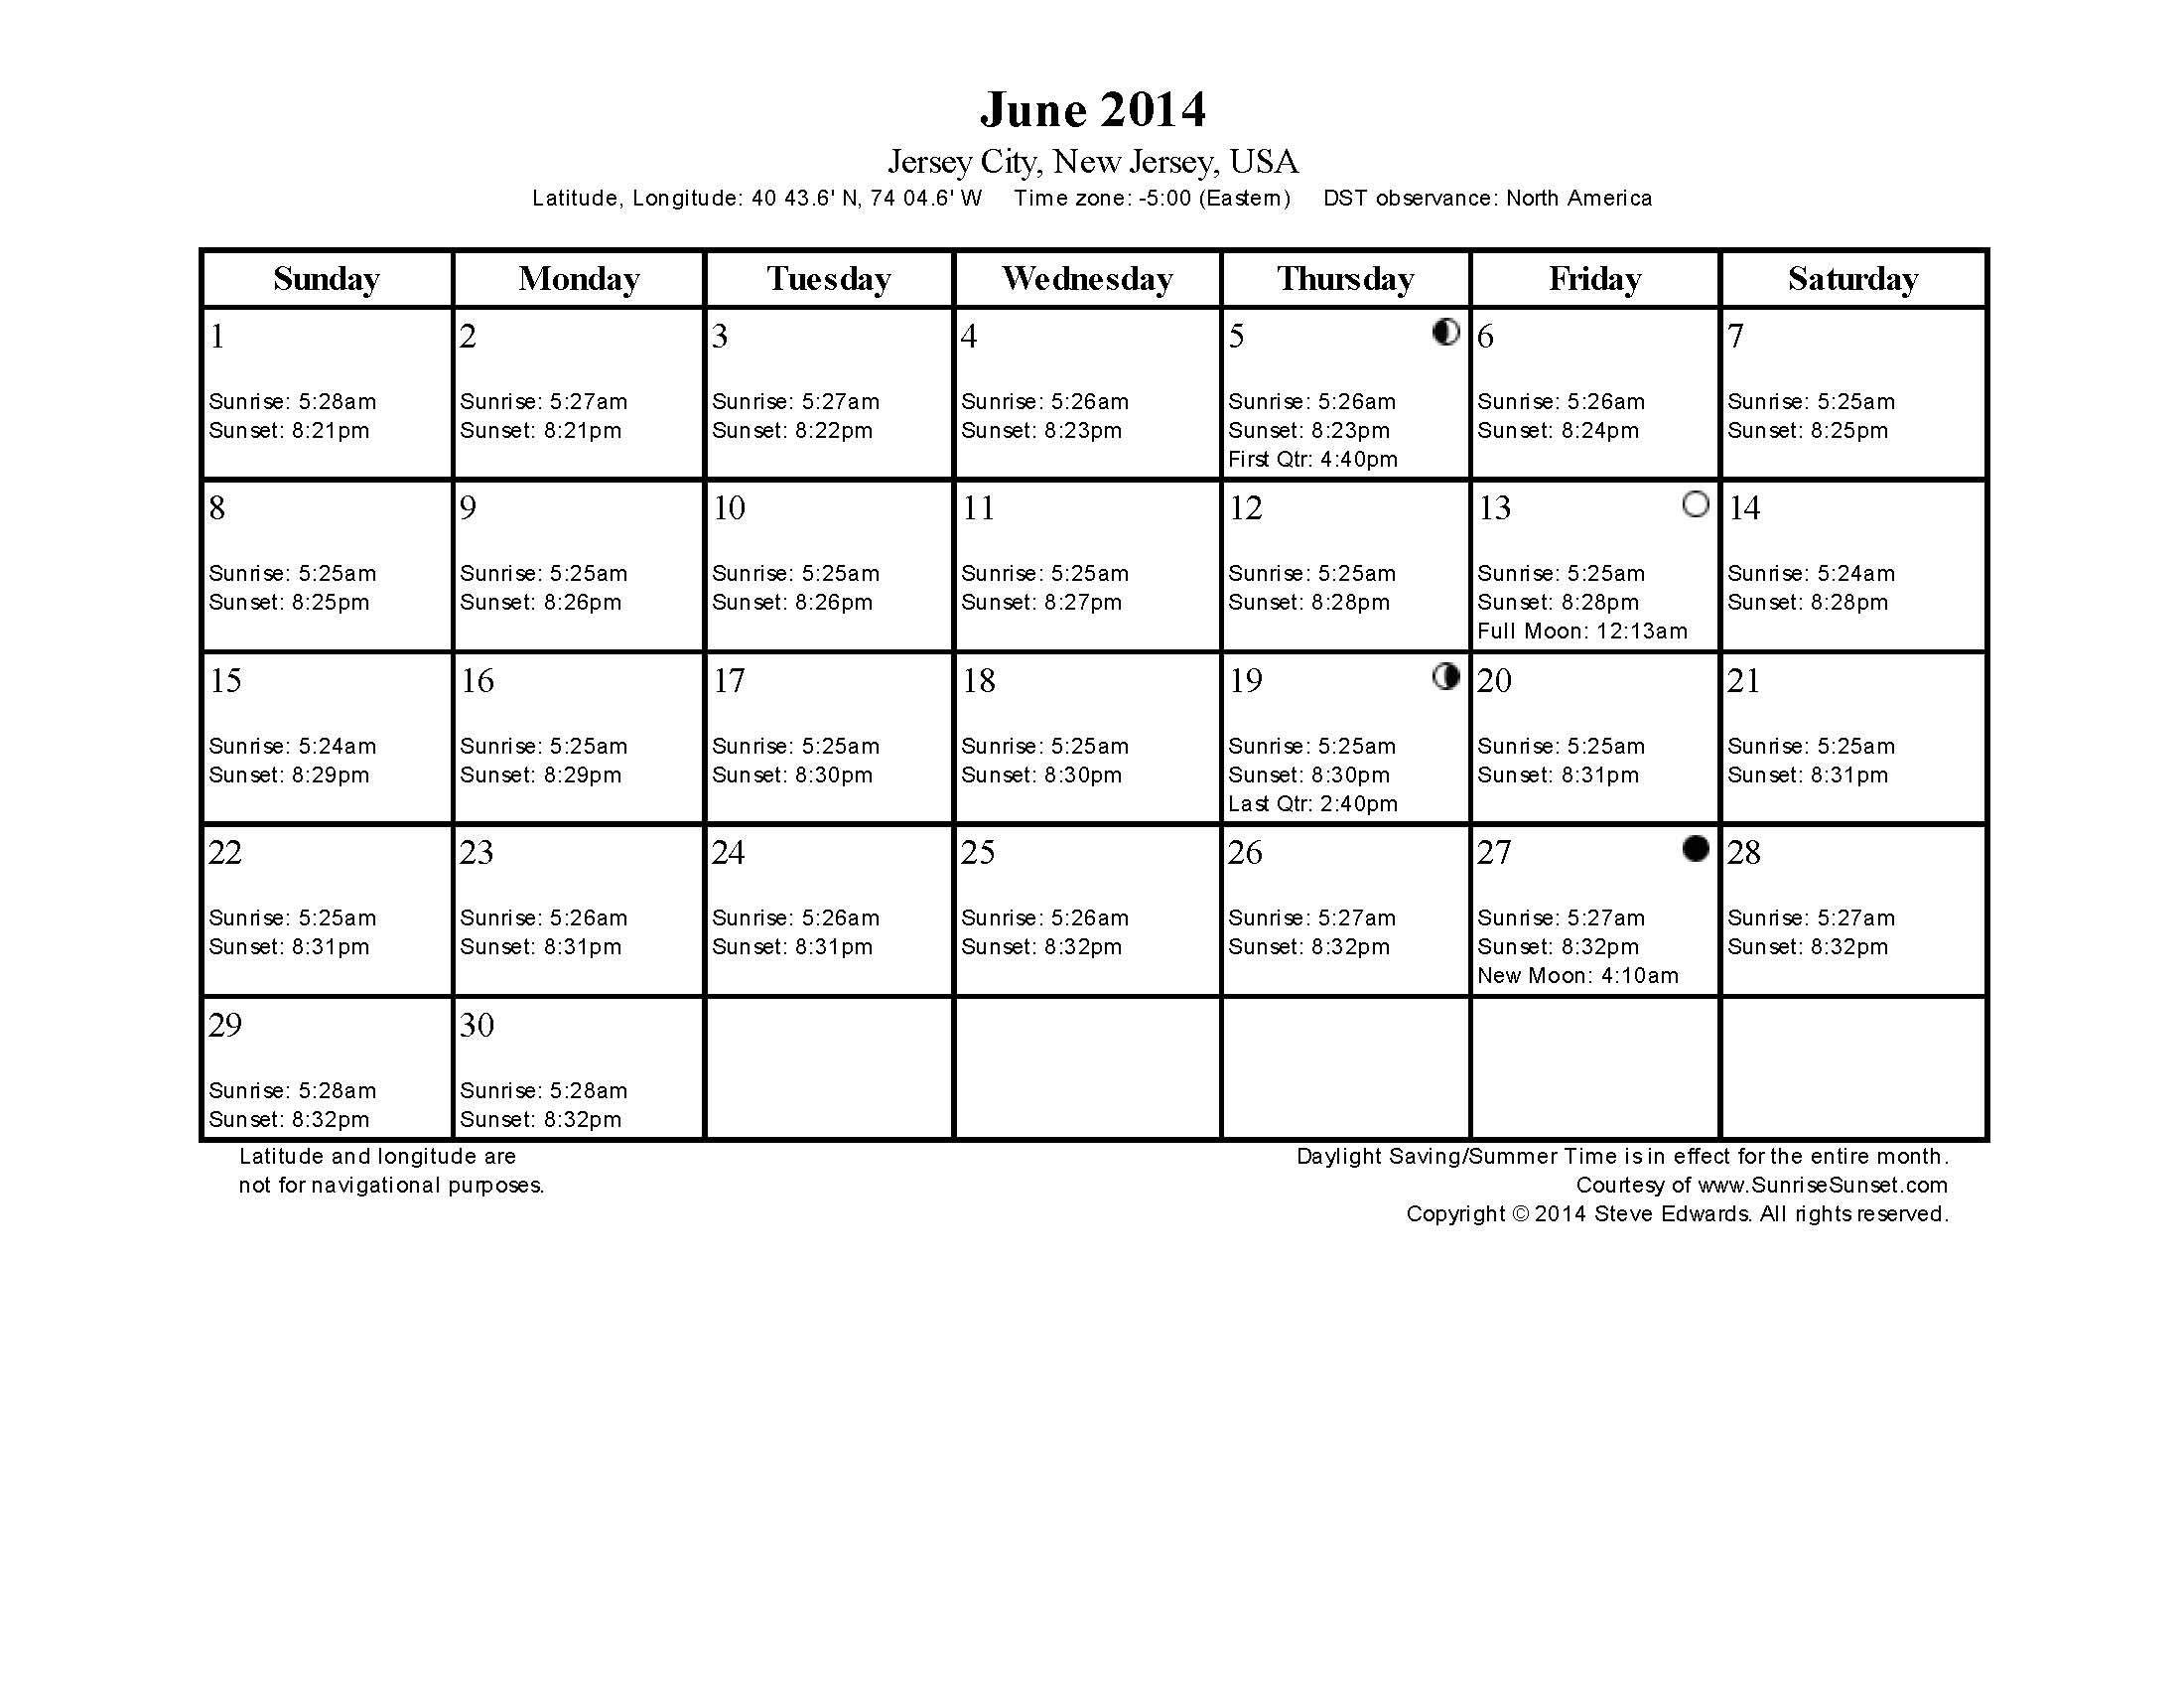 Sunrise / Sunset Calendar For Jersey City - June 2014 (With With Sunrise Sunset Calendar Printable